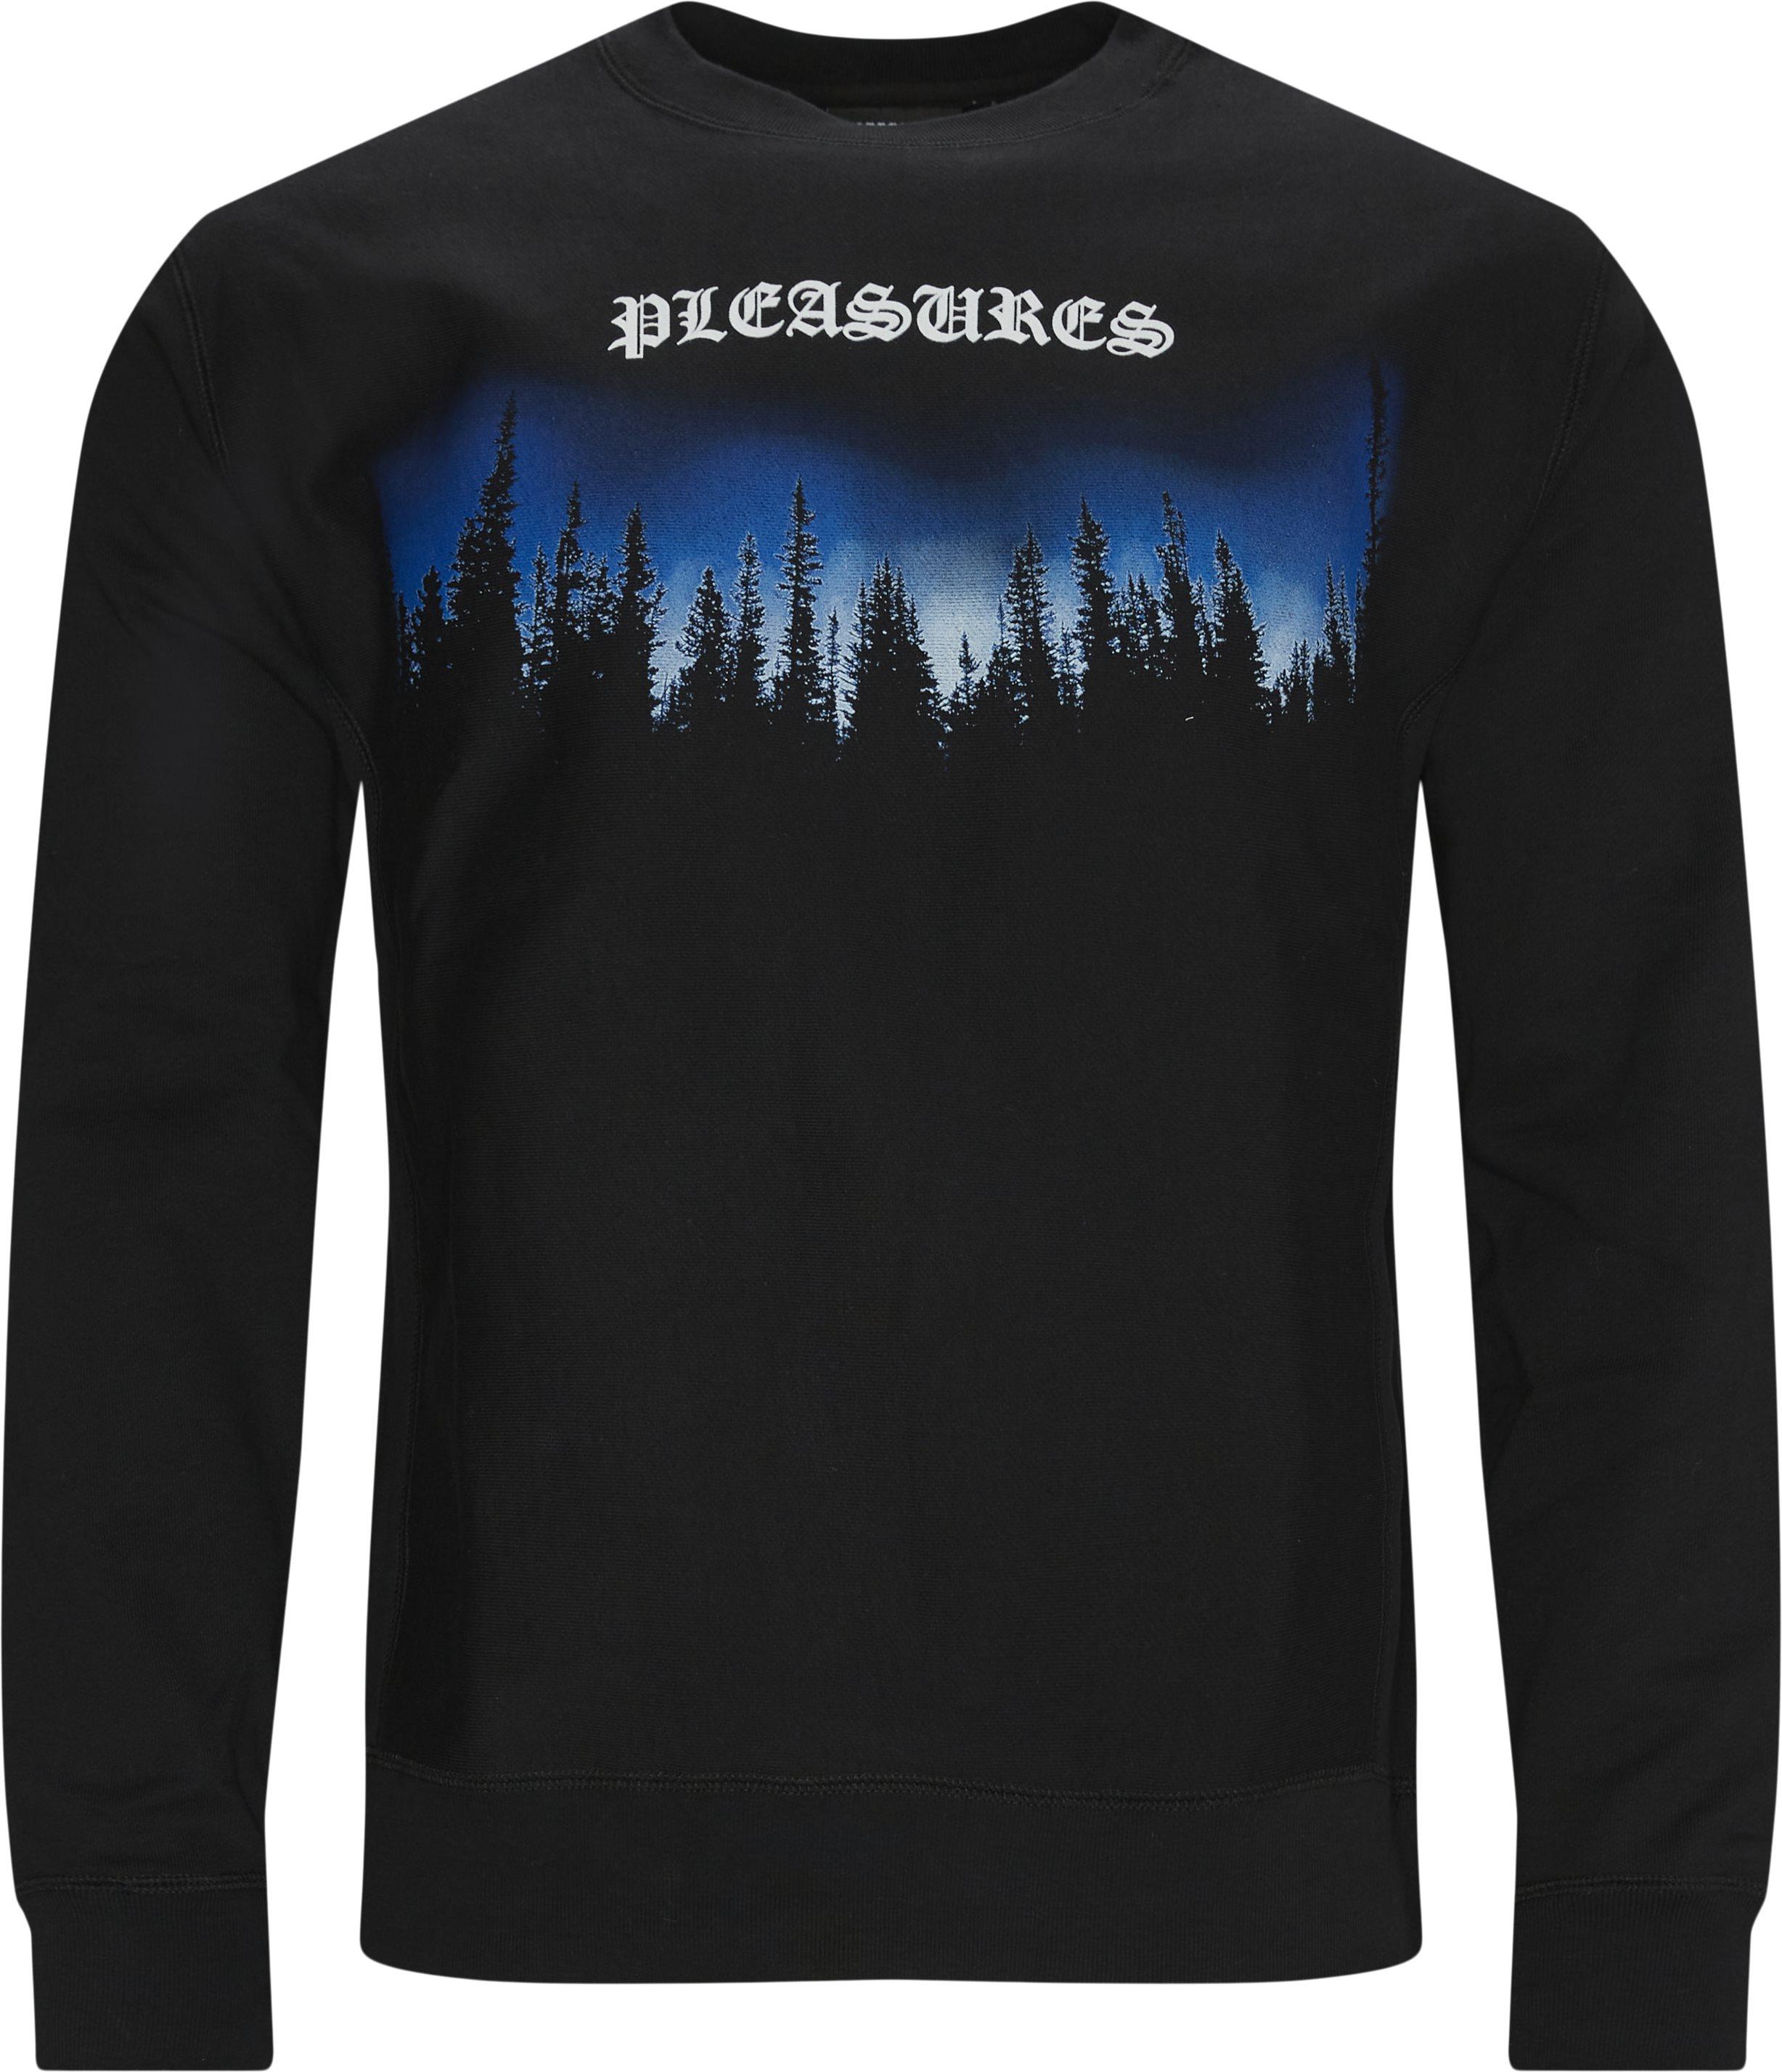 Forest Premium Crewneck Sweatshirt - Sweatshirts - Regular - Sort